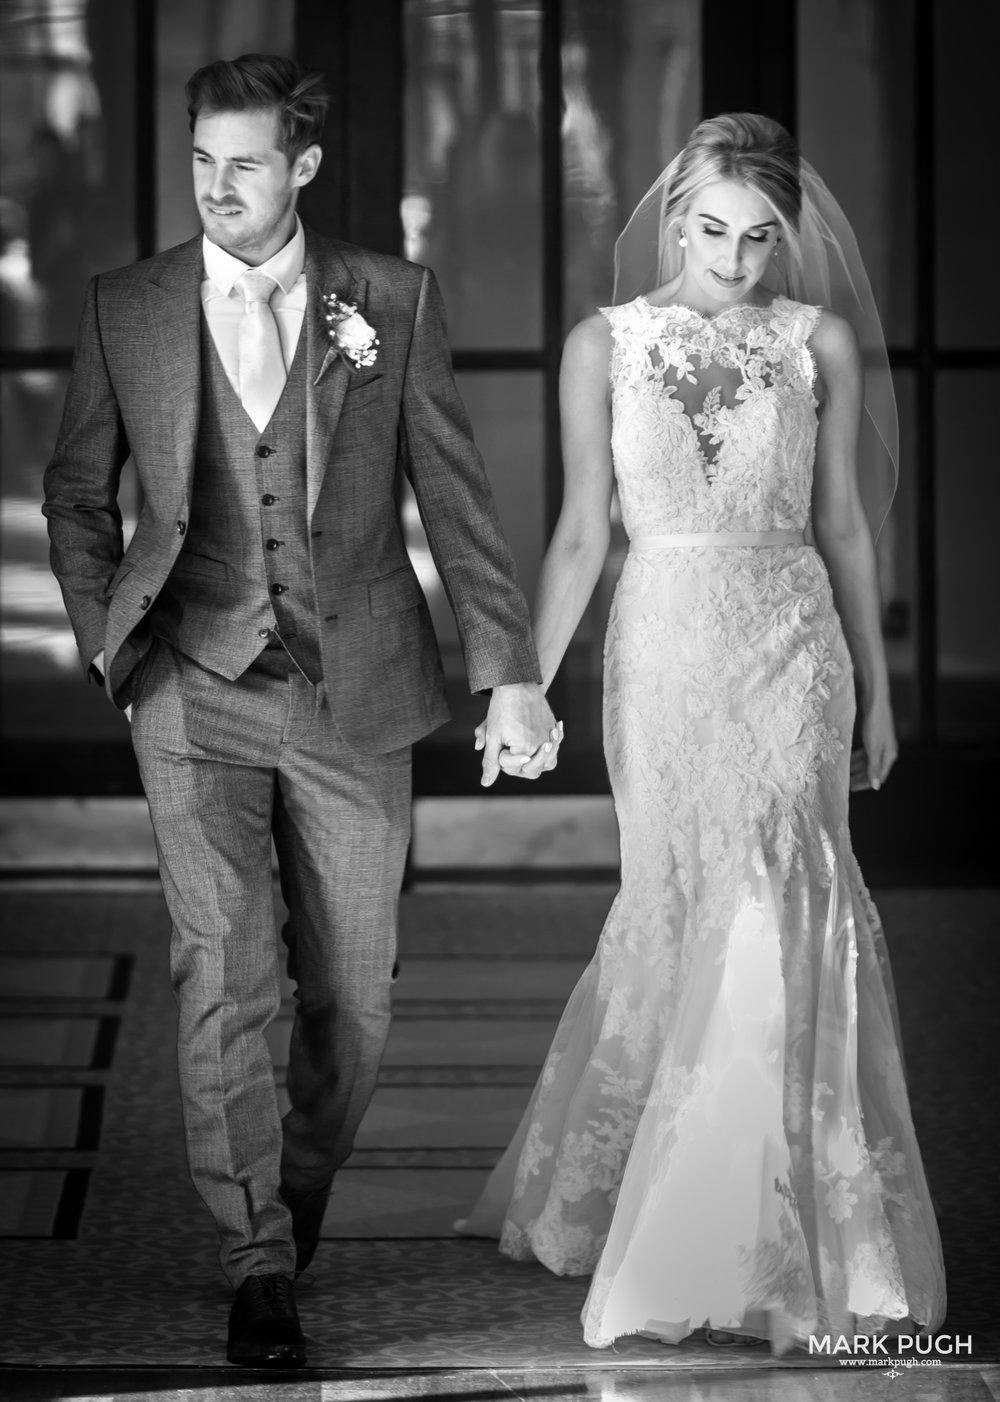 100 - Lucy and  Steven fineART wedding photography by www.markpugh.com Mark Pugh of www.mpmedia.co.uk_.JPG